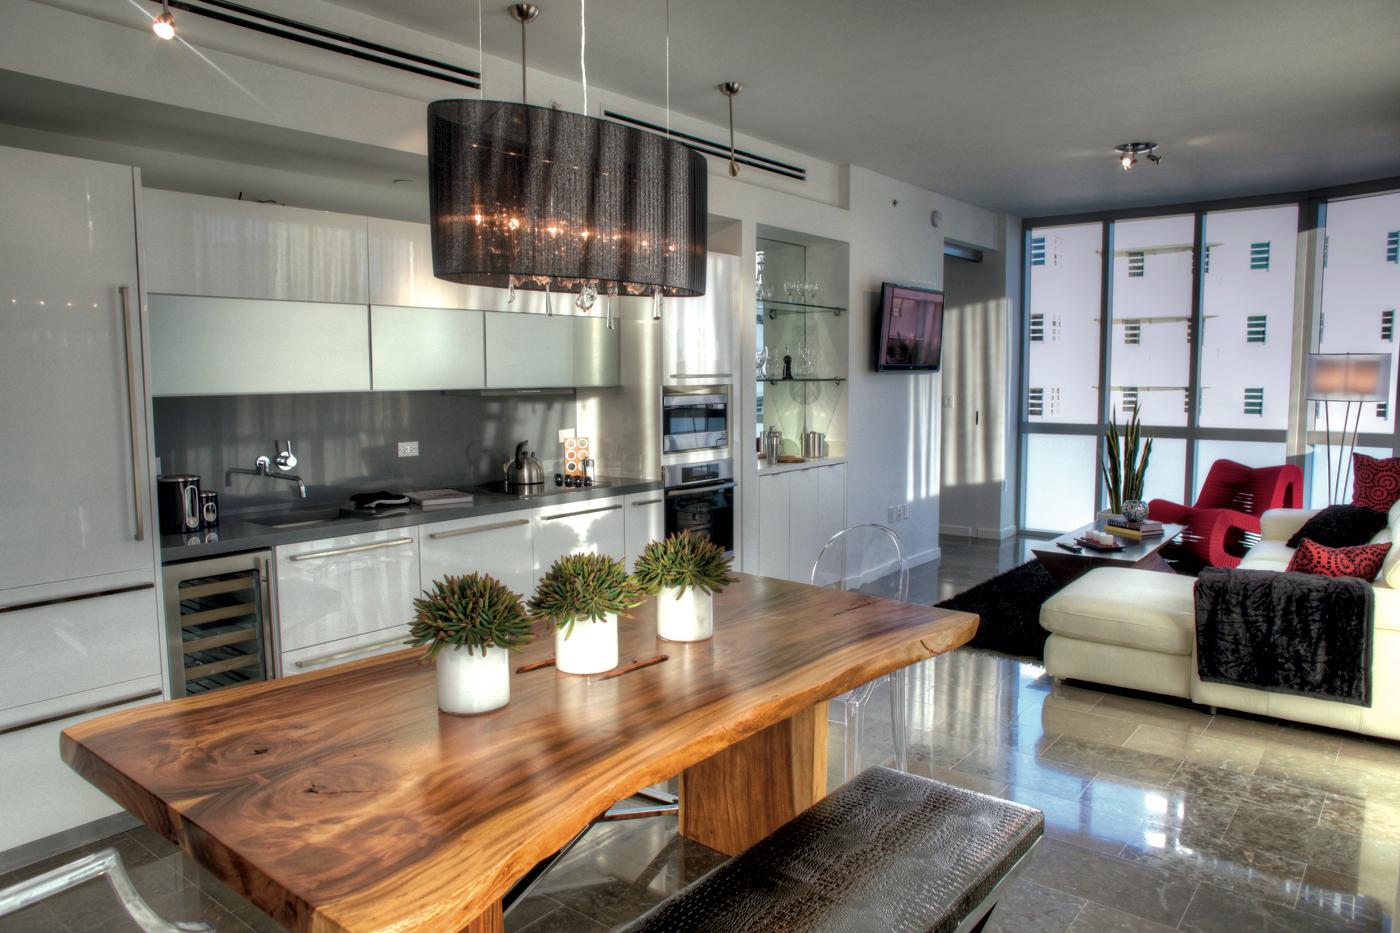 Boulan South Beach Reaches 20 In Unit S World Property Journal Global News Center